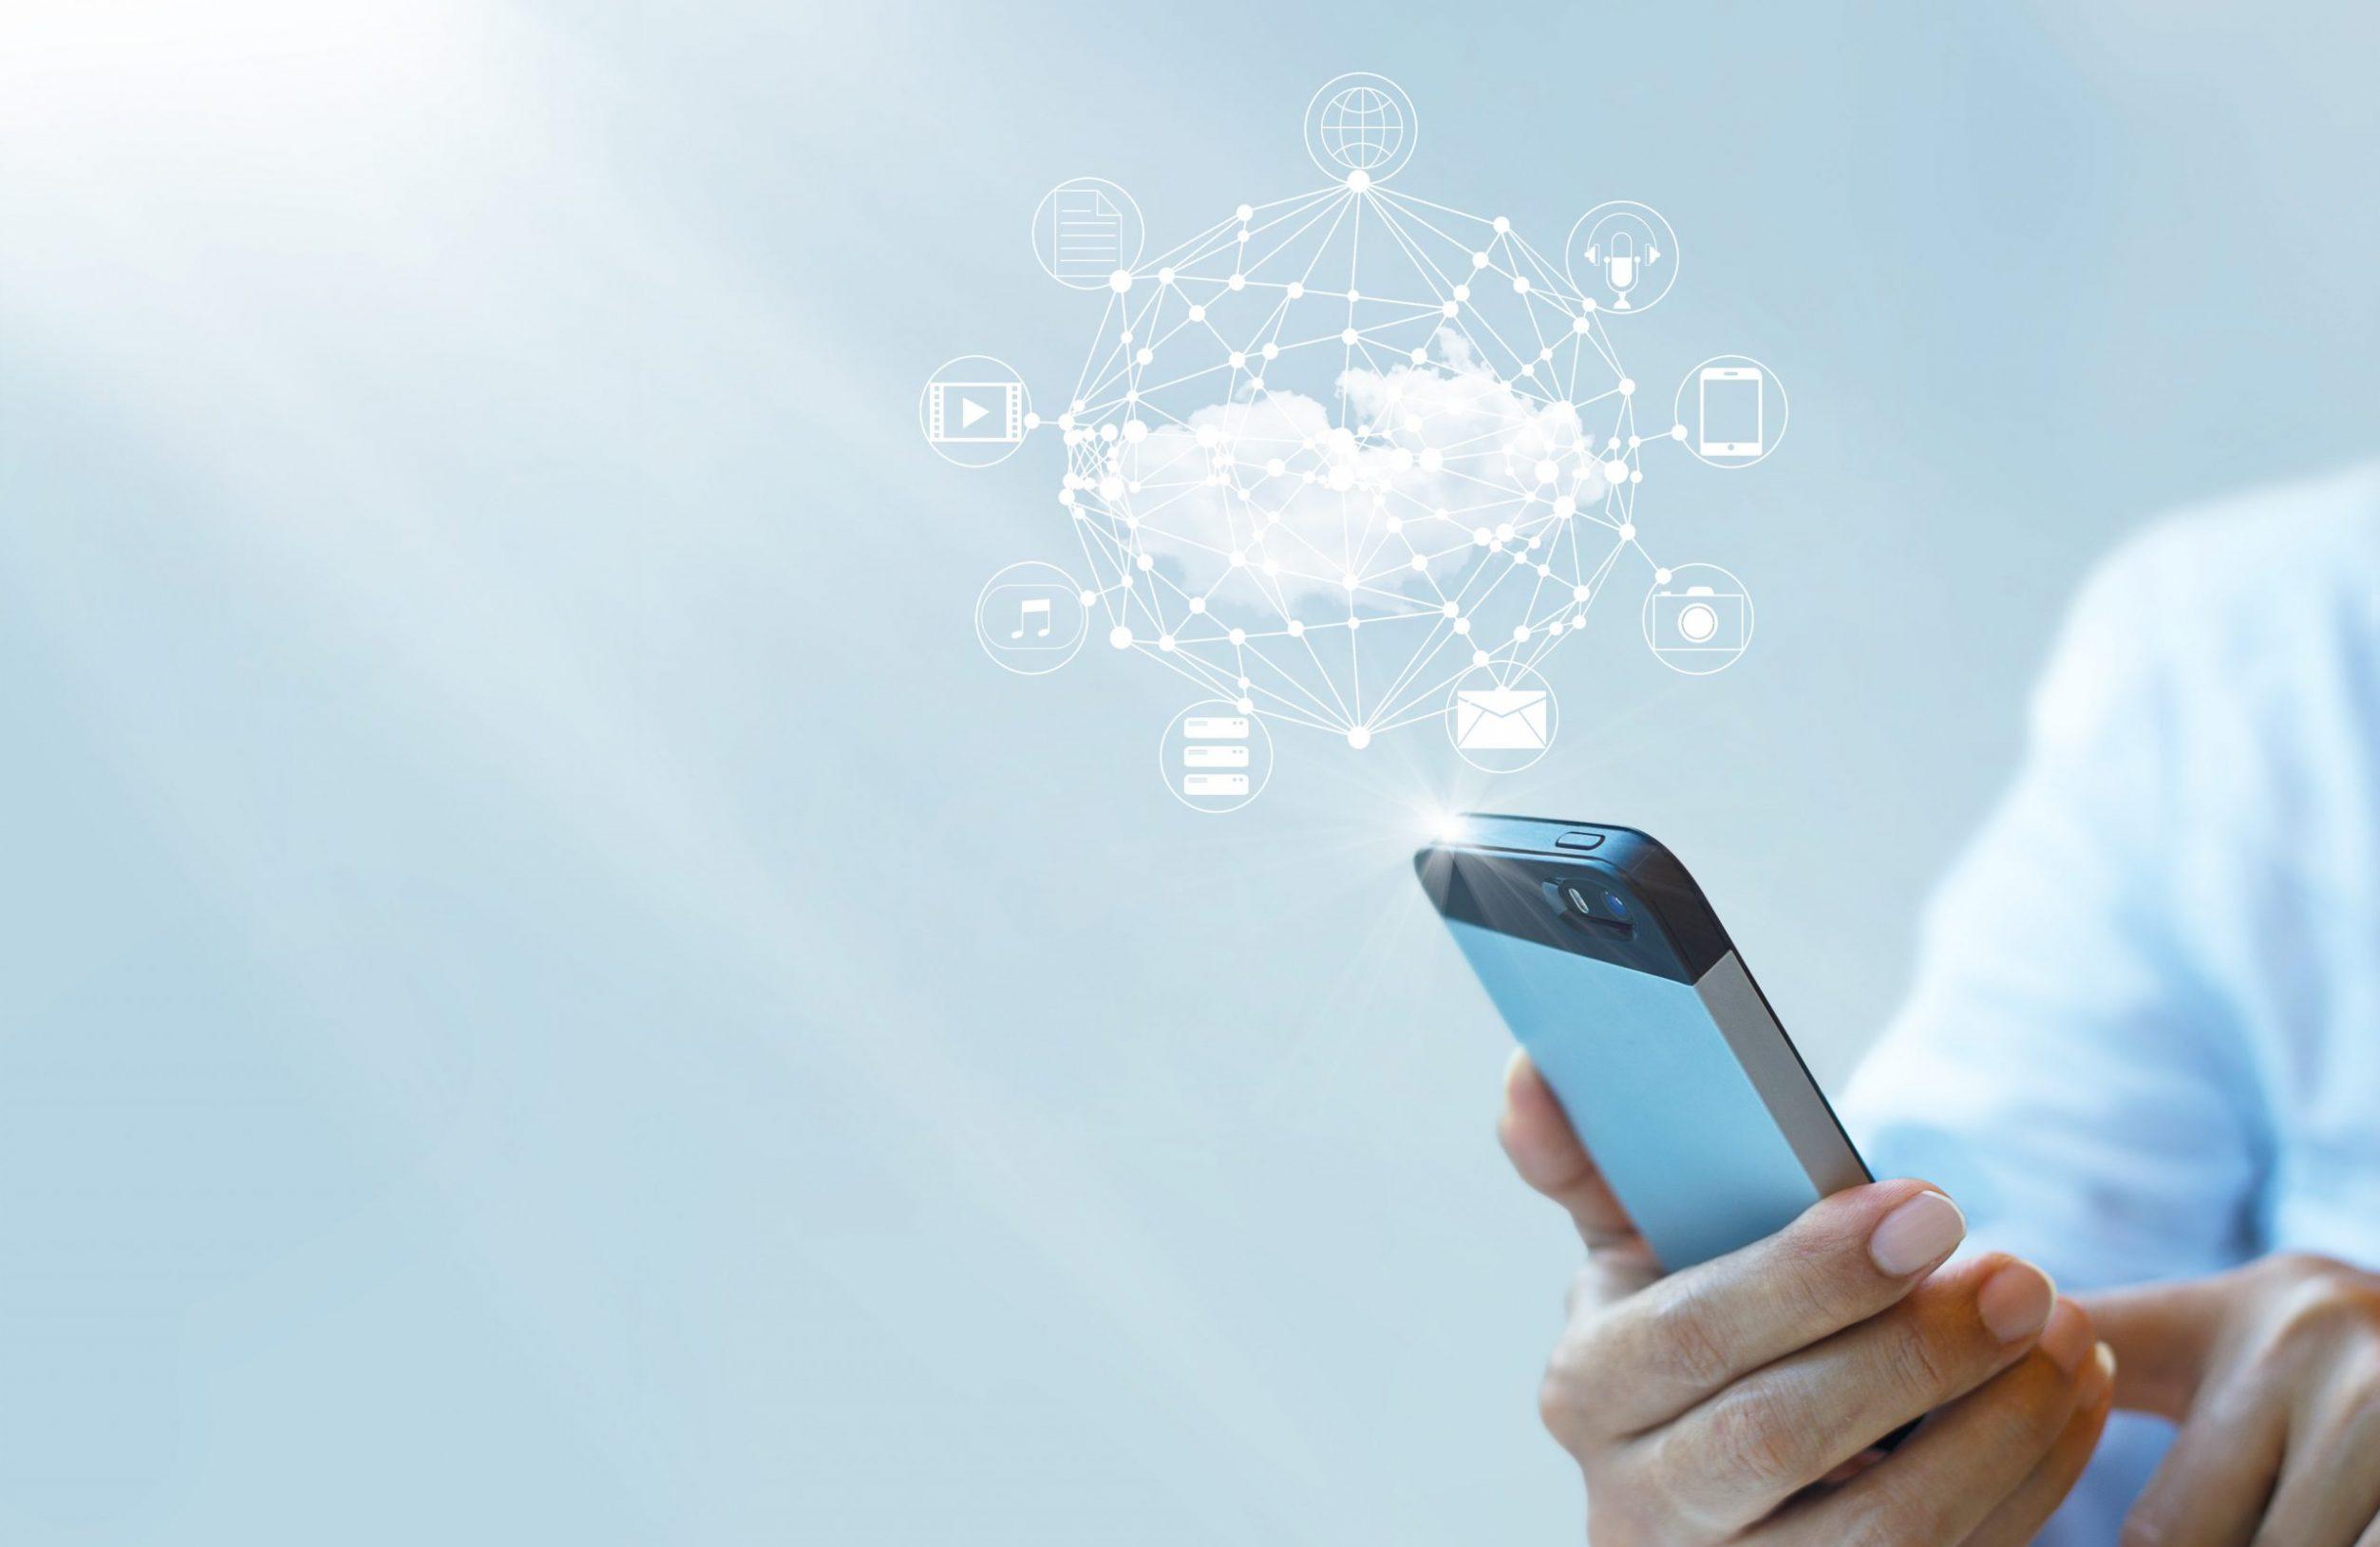 rmda-ss-phone-cloud.2560.1698